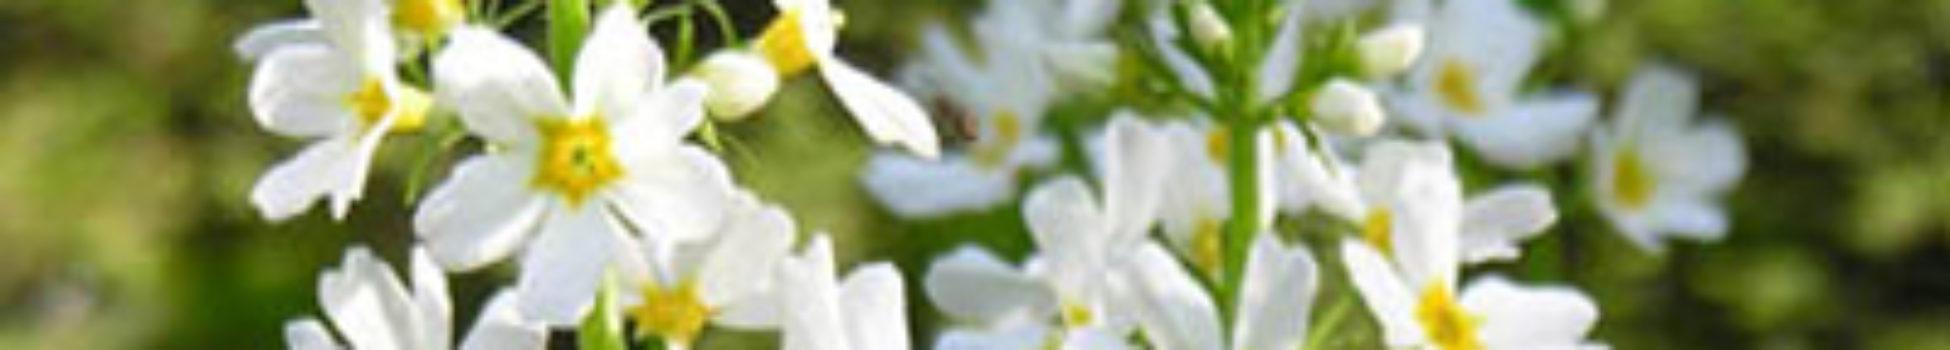 Luz Pura Floral Violeta de Agua-Espiritualidad. Curso online